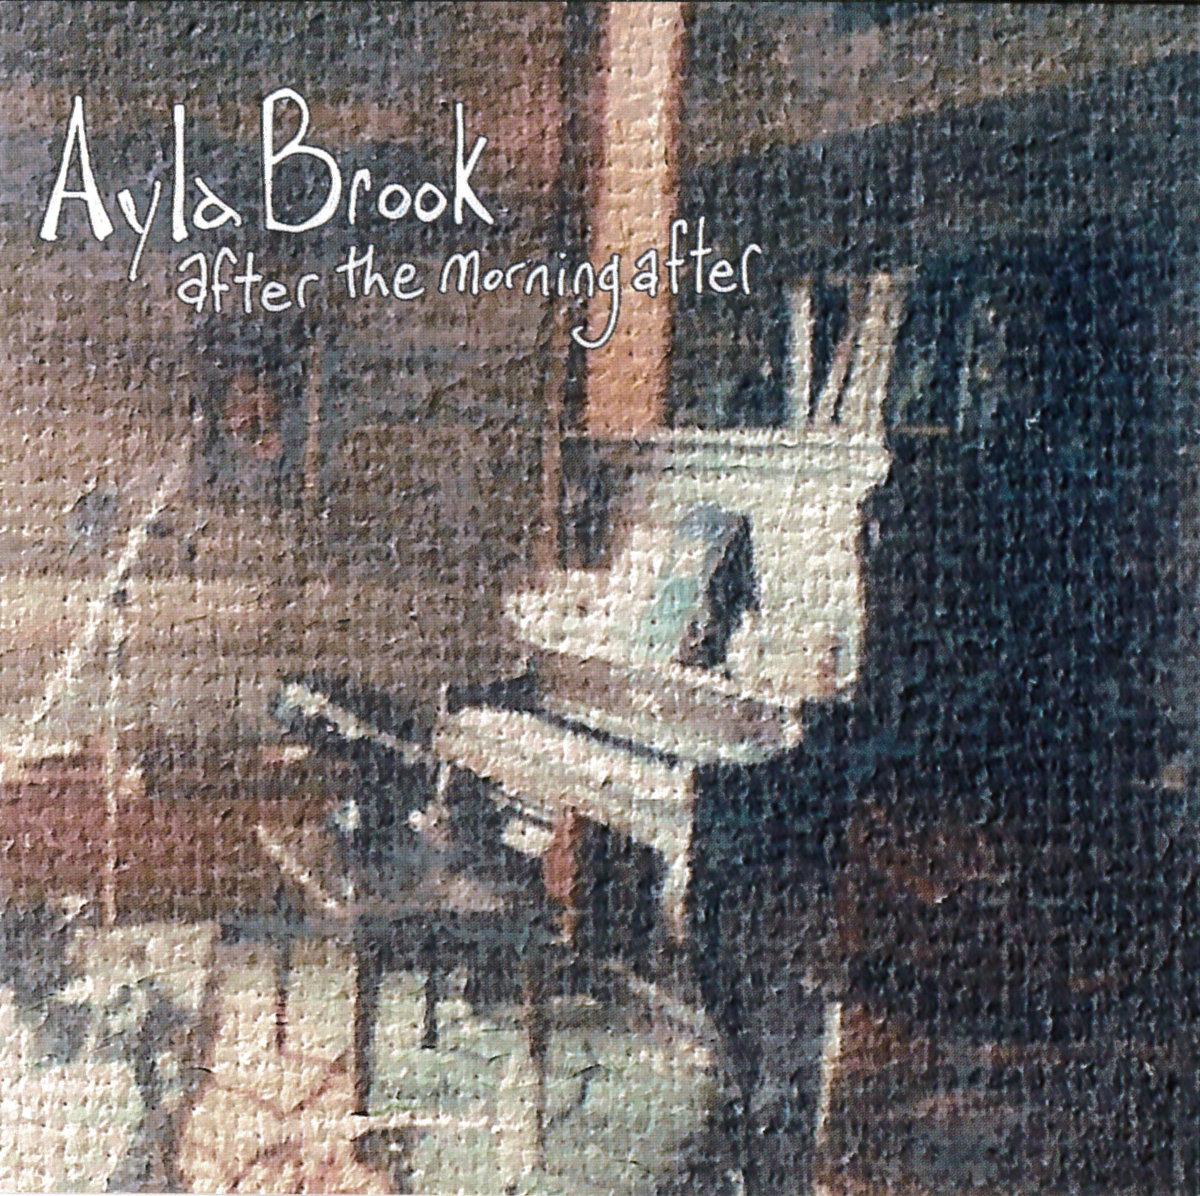 - Ayla Brook - After The Morning AfterProducer, Mix